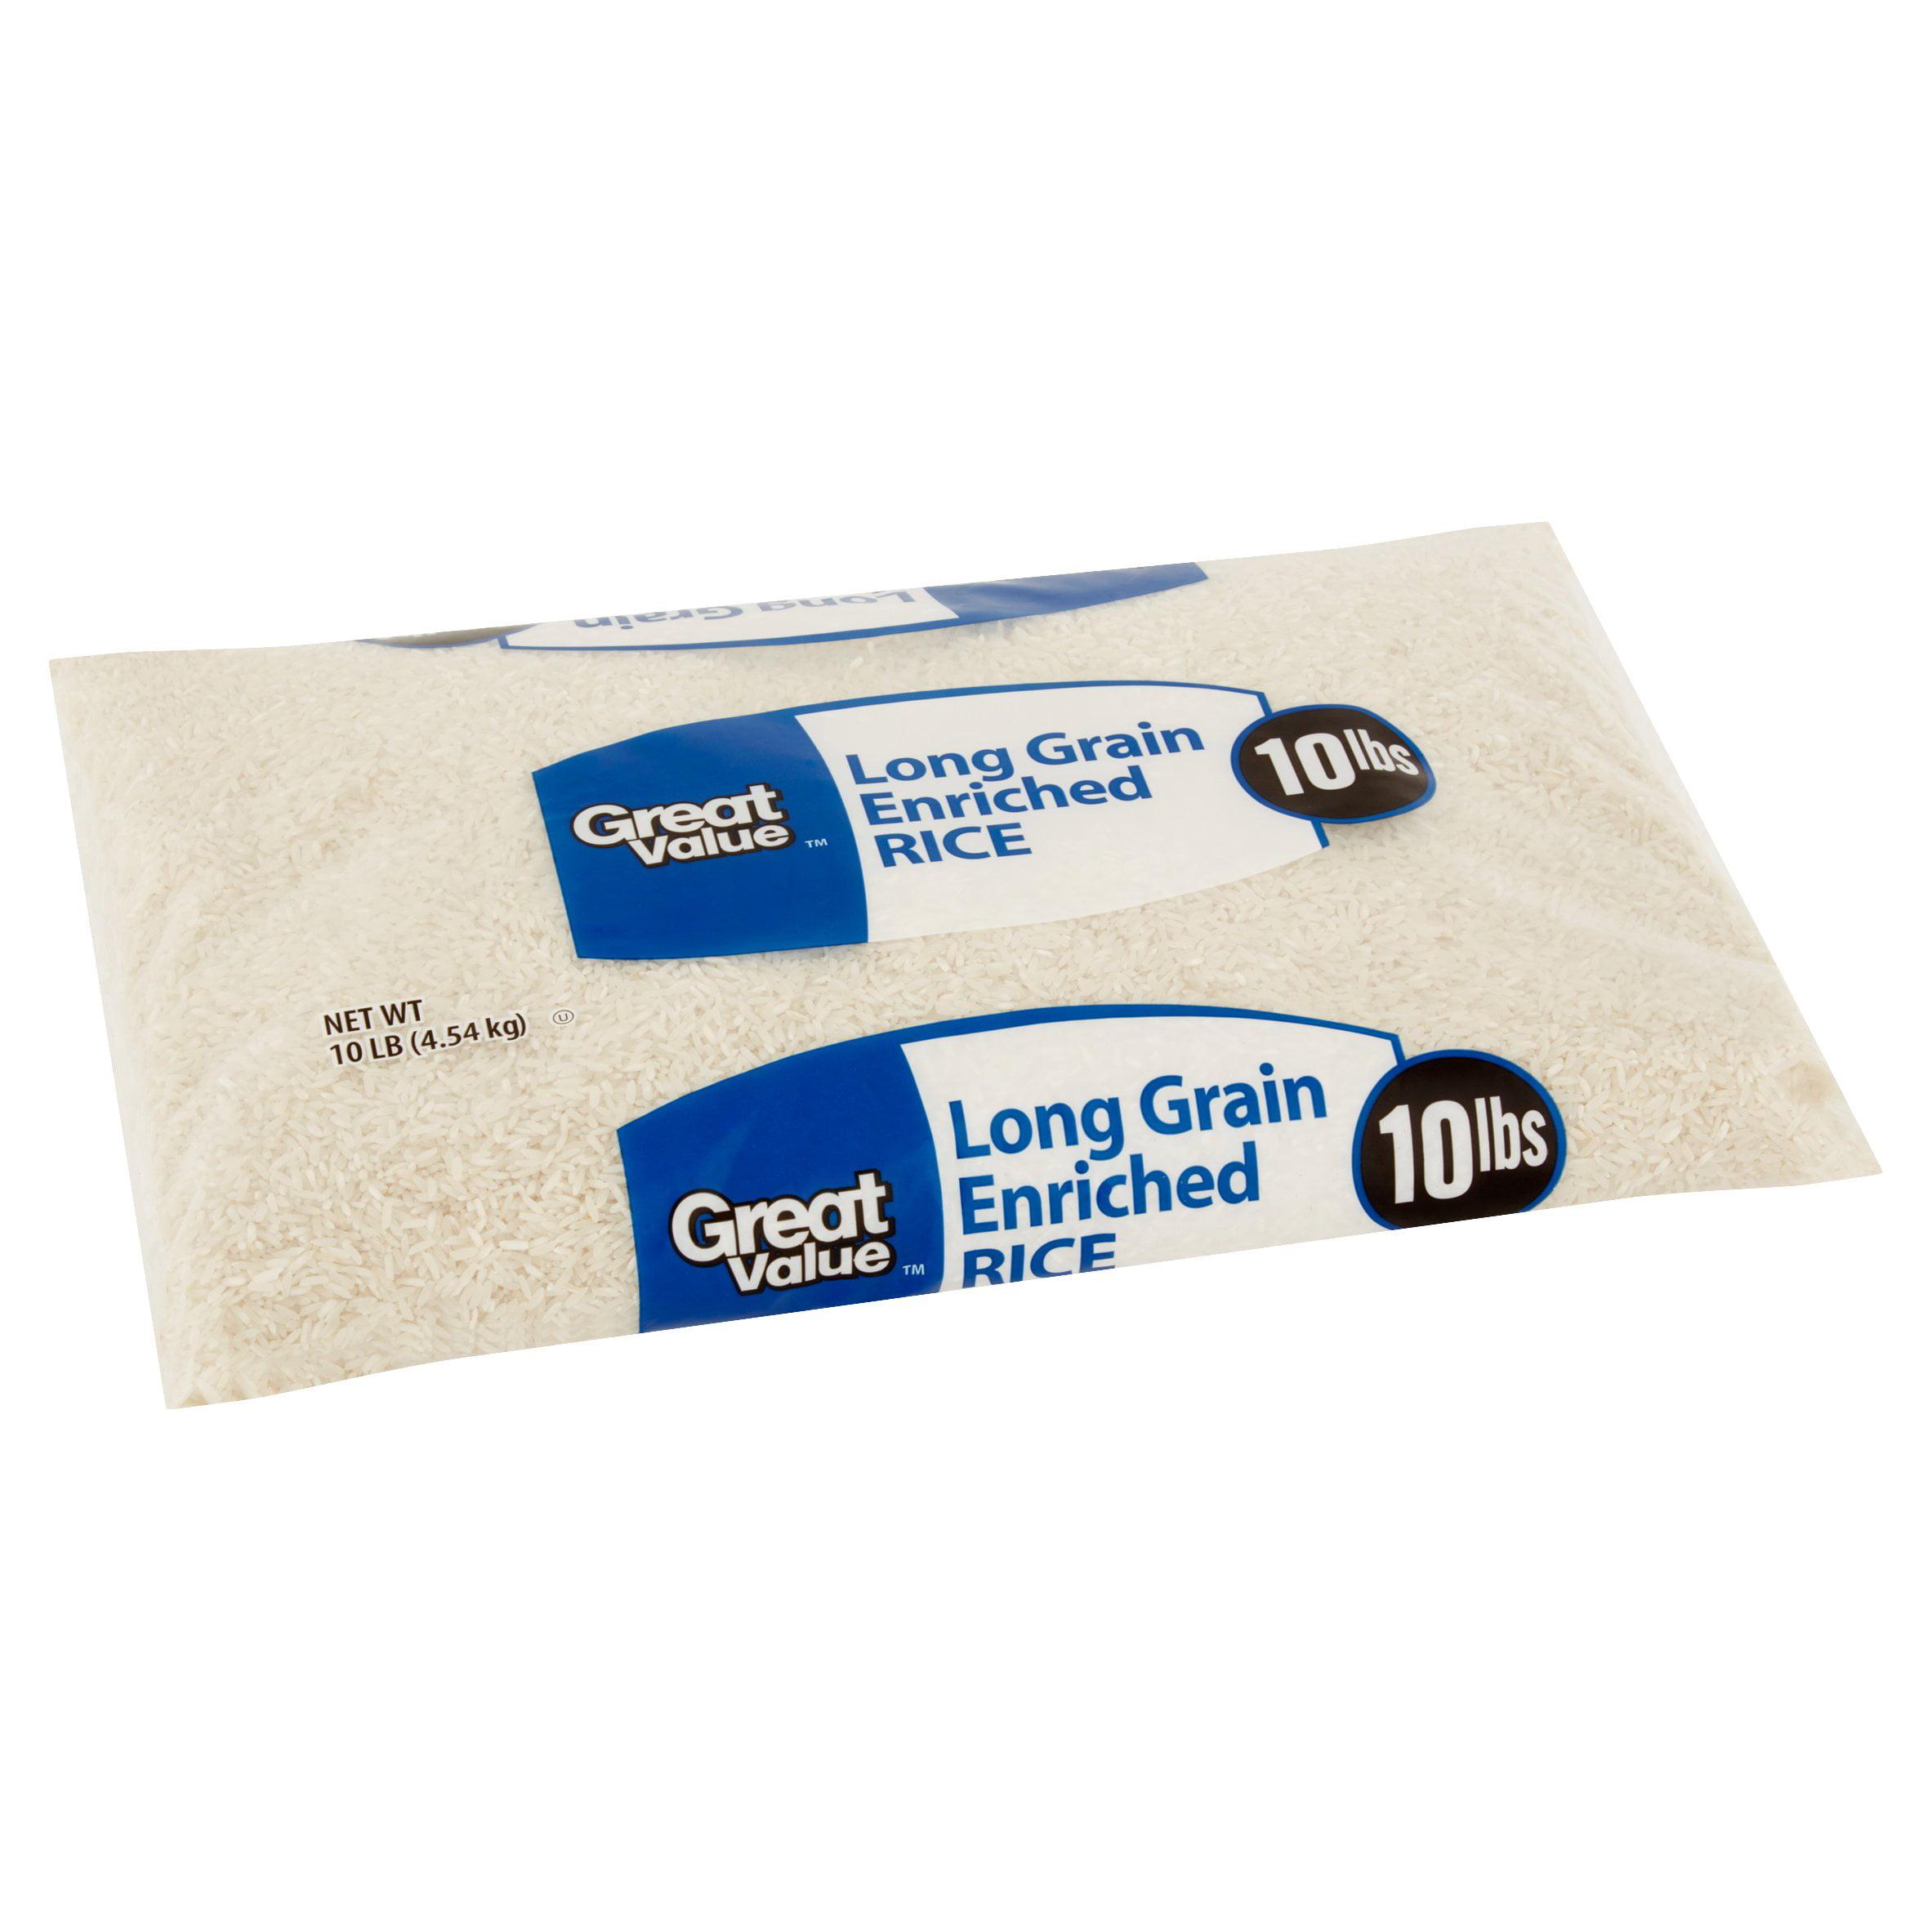 Great Value Long Grain Enriched Rice, 10 lb - Walmart com